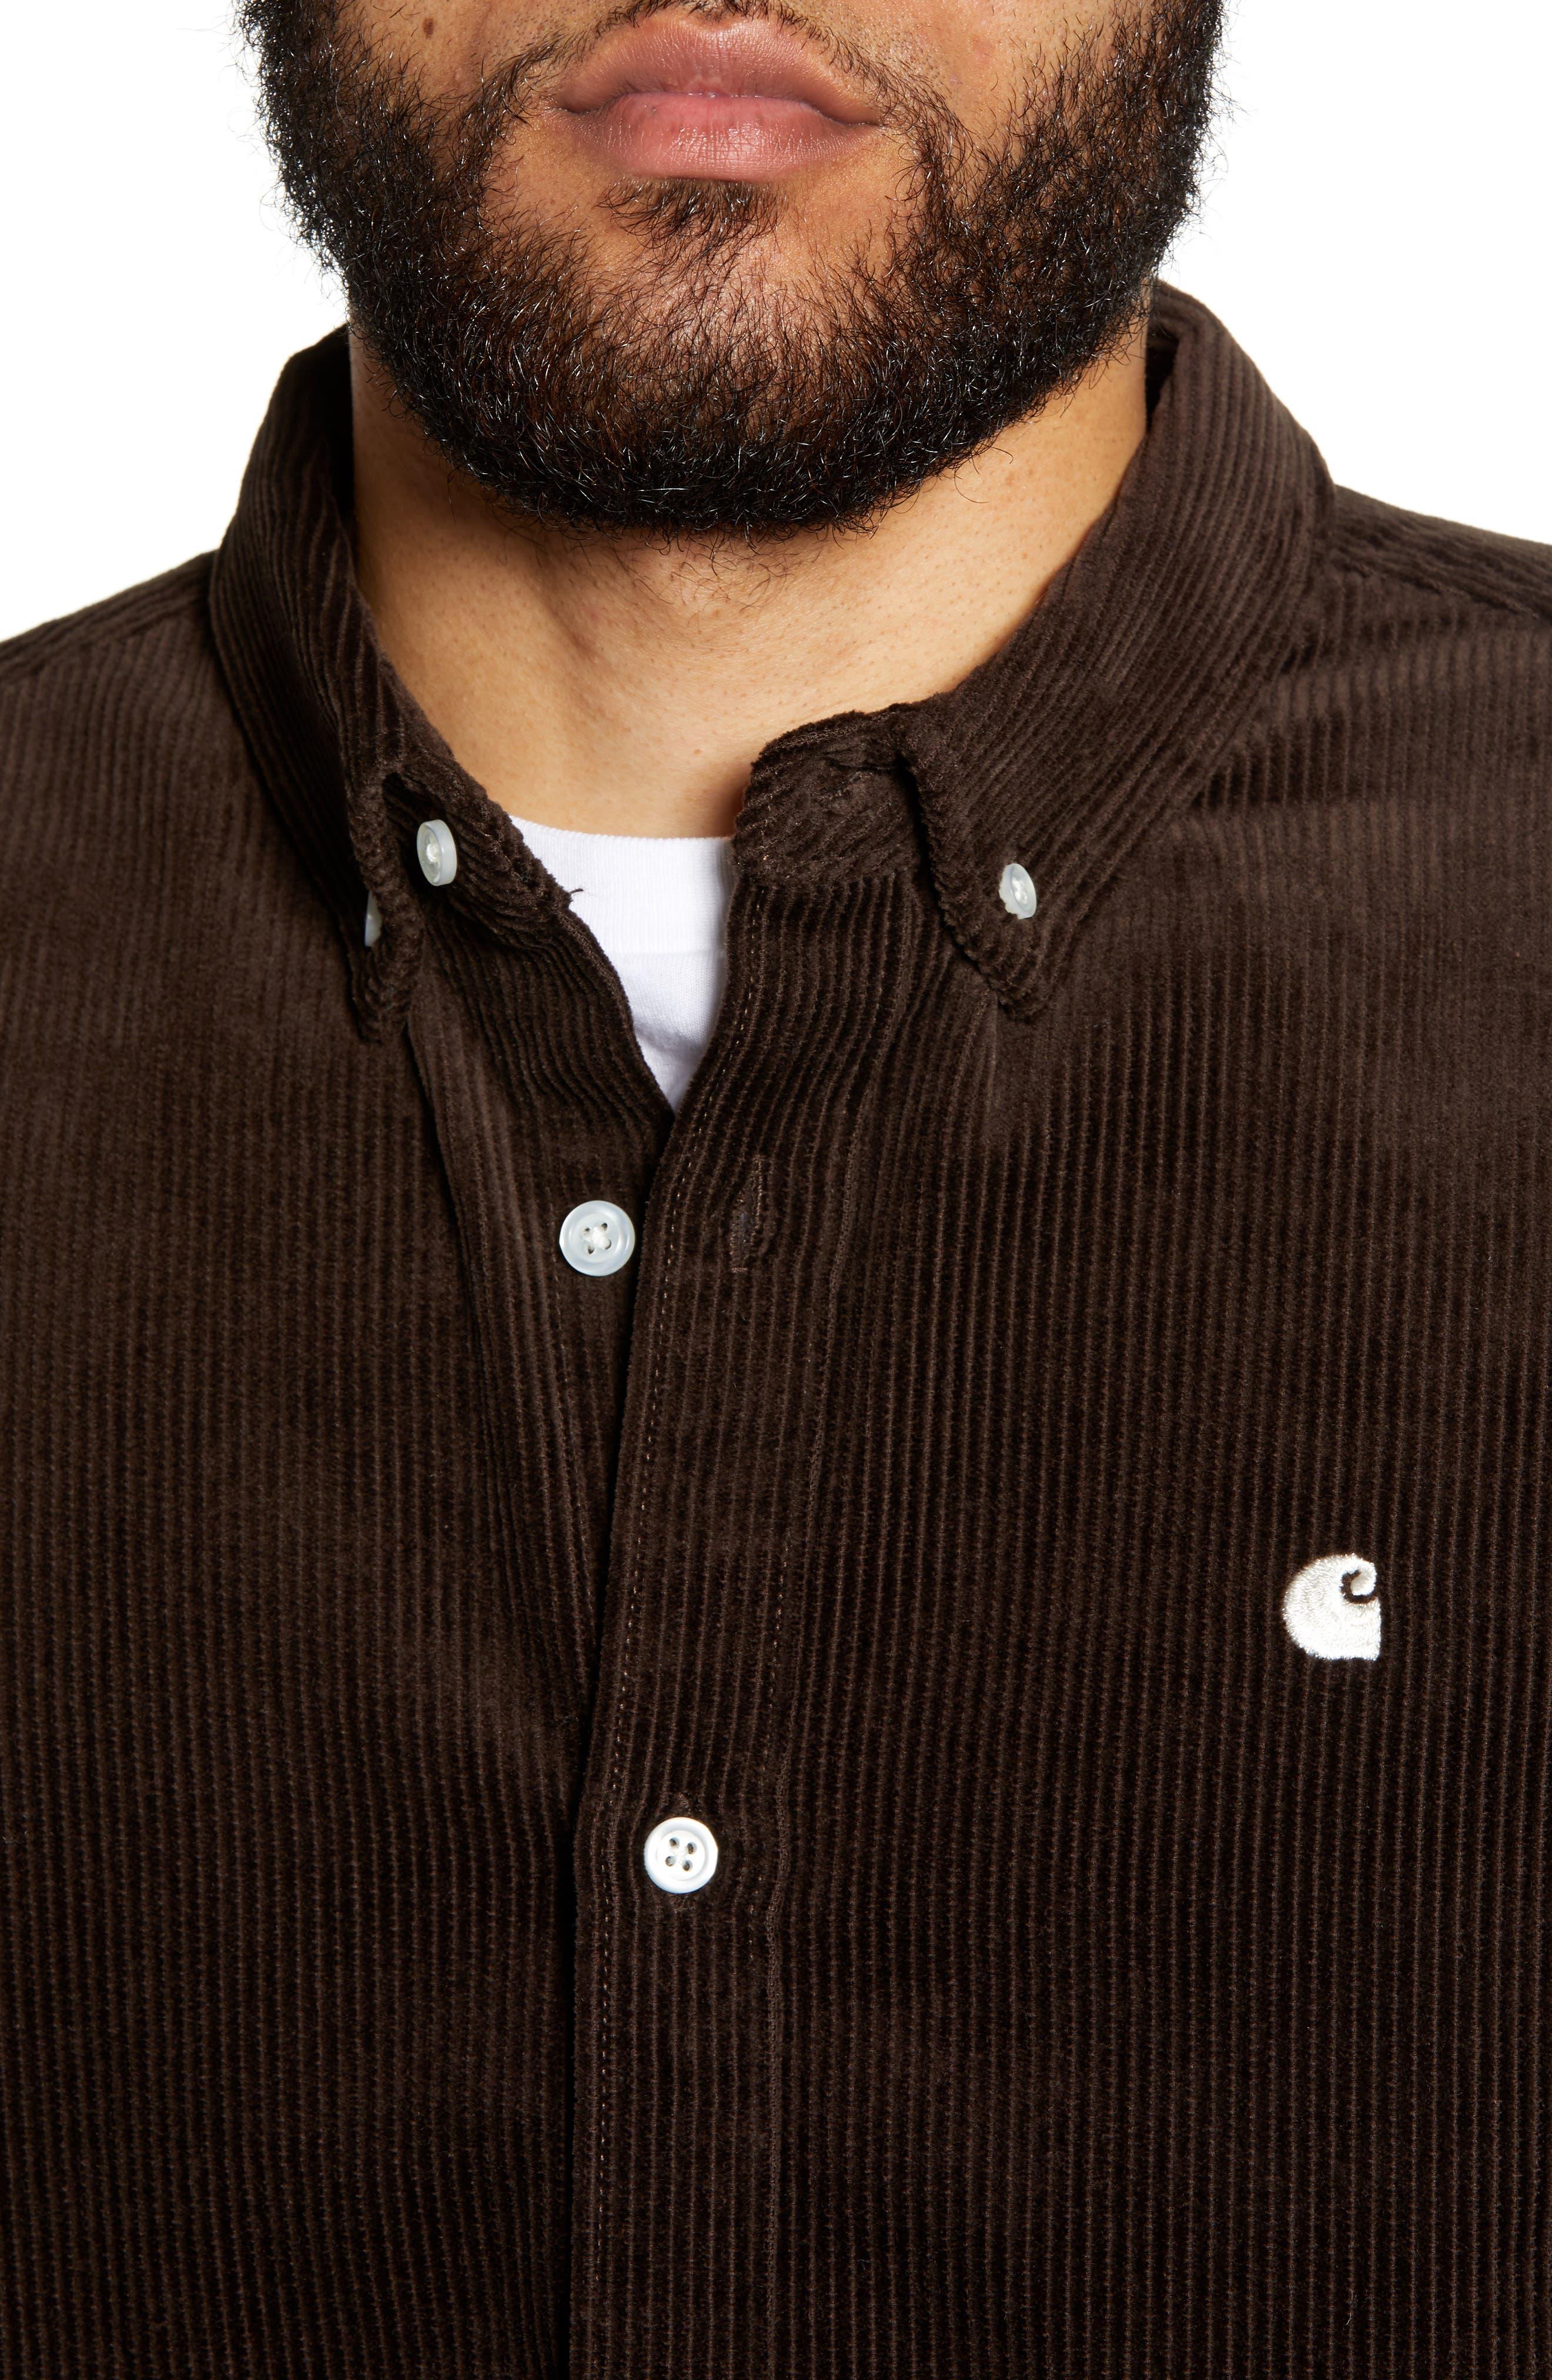 Madison Corduroy Shirt,                             Alternate thumbnail 2, color,                             TOBACCO / WAX